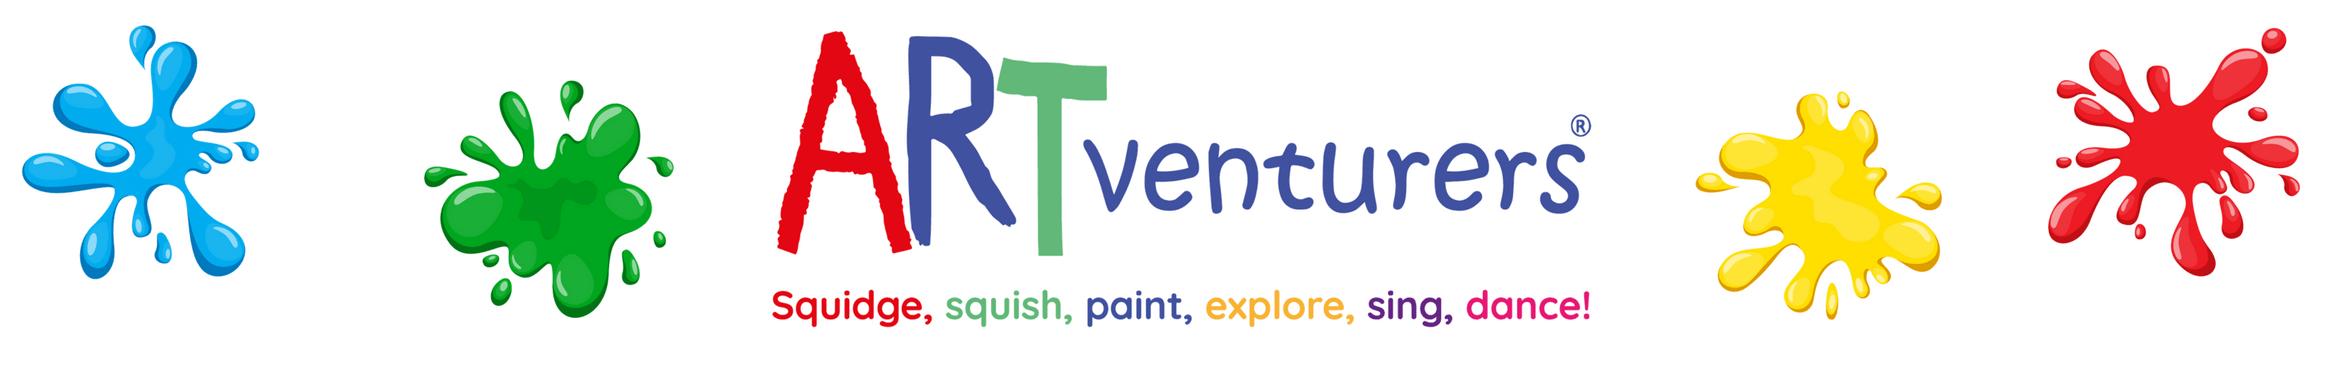 ARTventurers Inverness